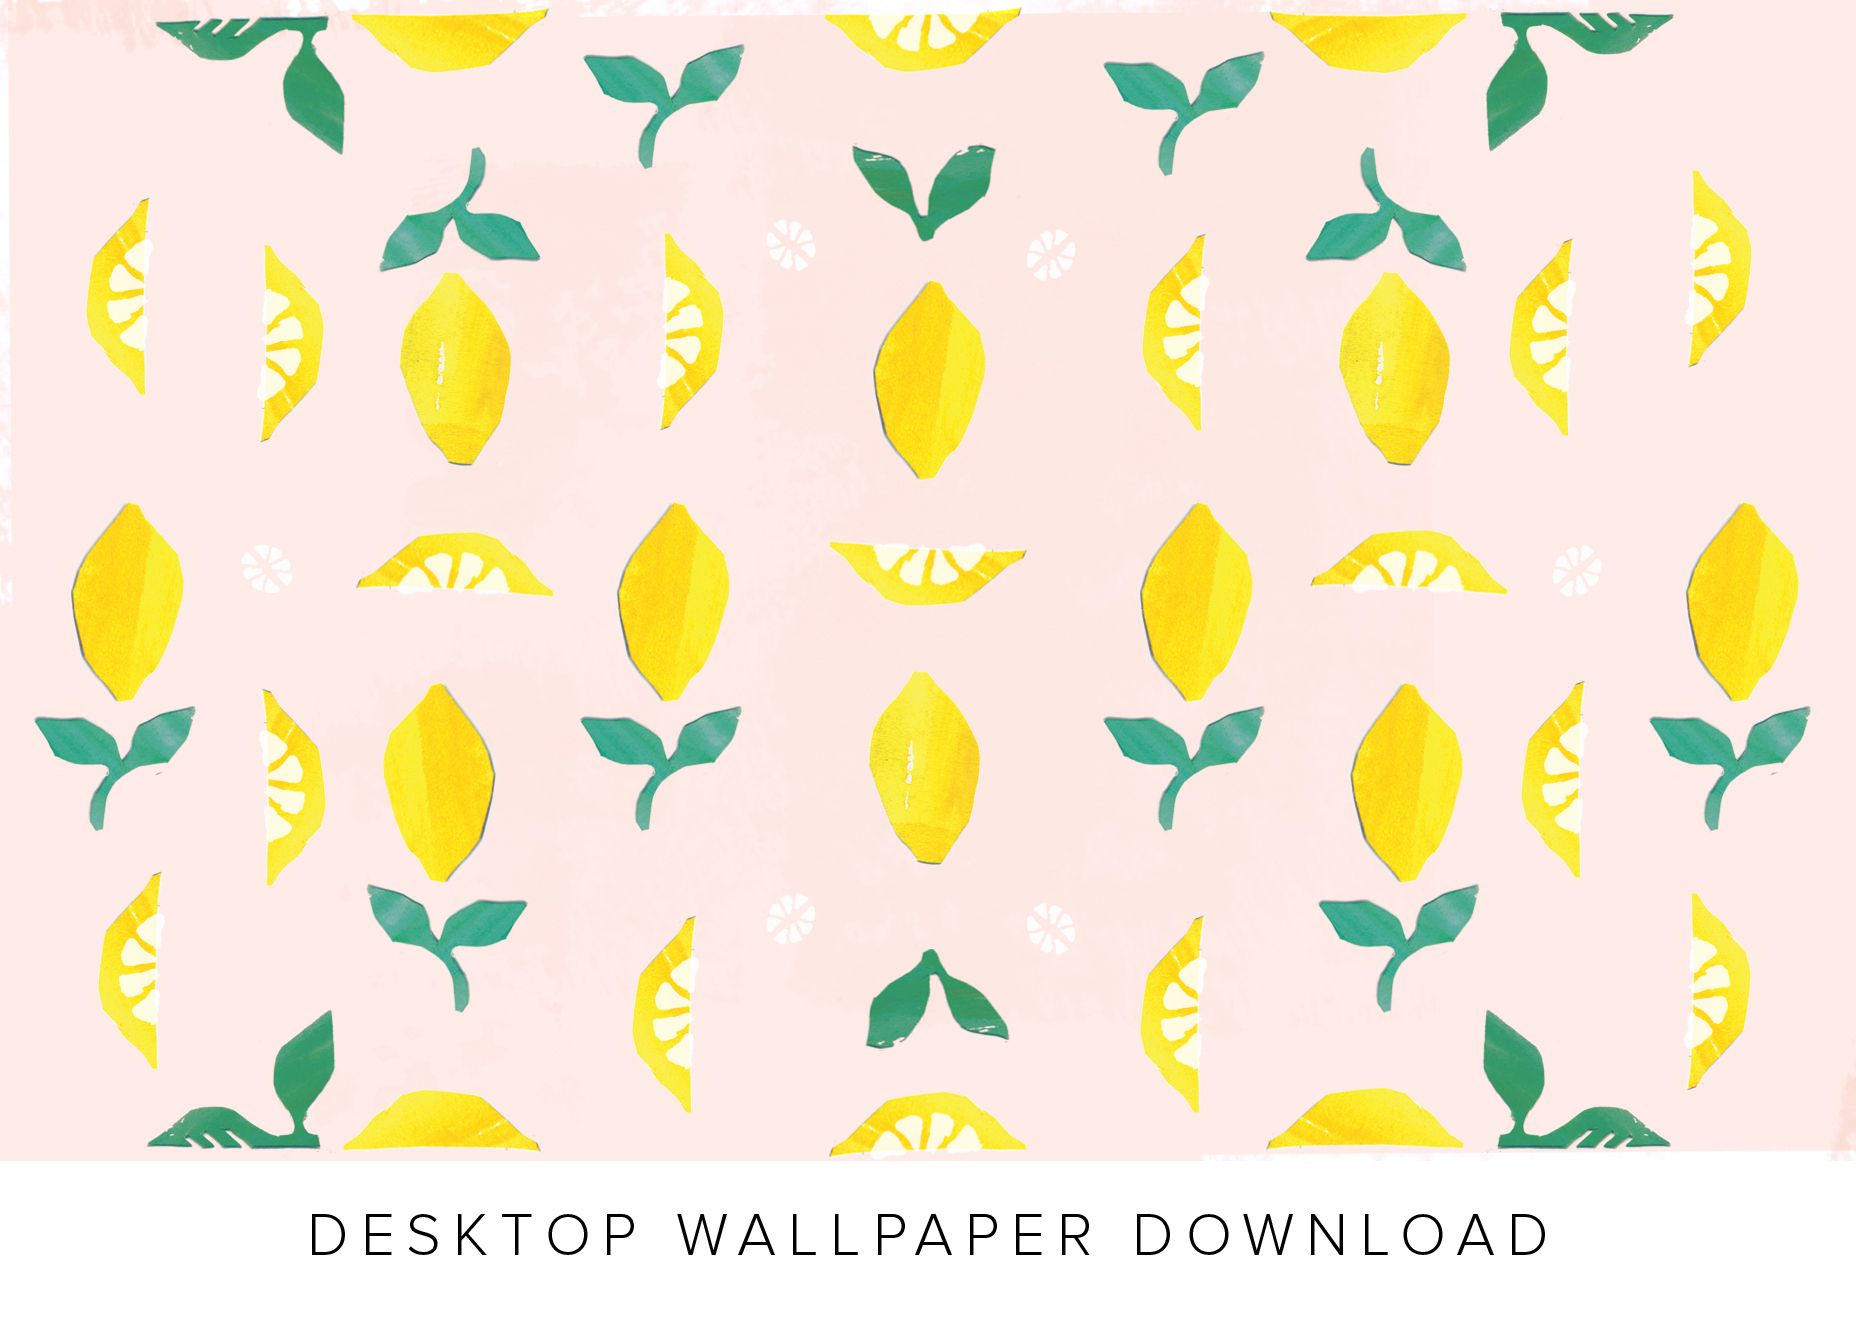 End of Summer invitation and desktop wallpaper Desktop